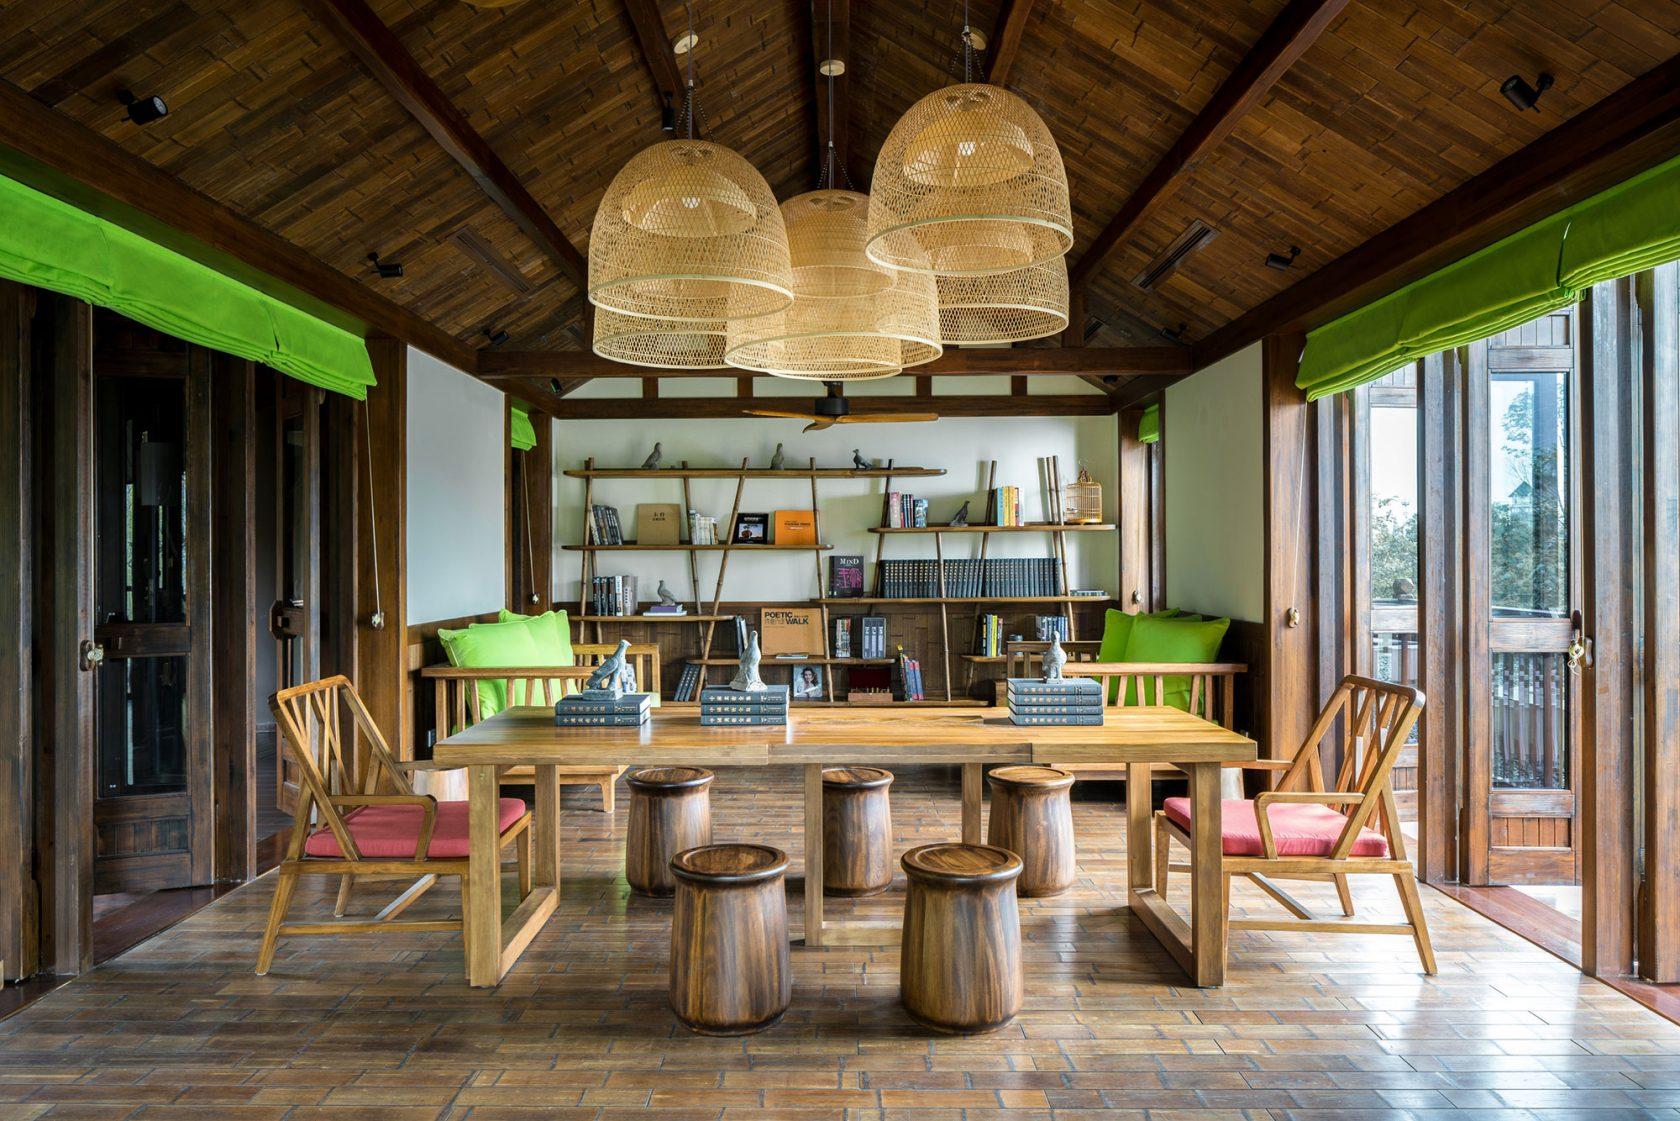 Six Senses Qing Cheng Mountain Library